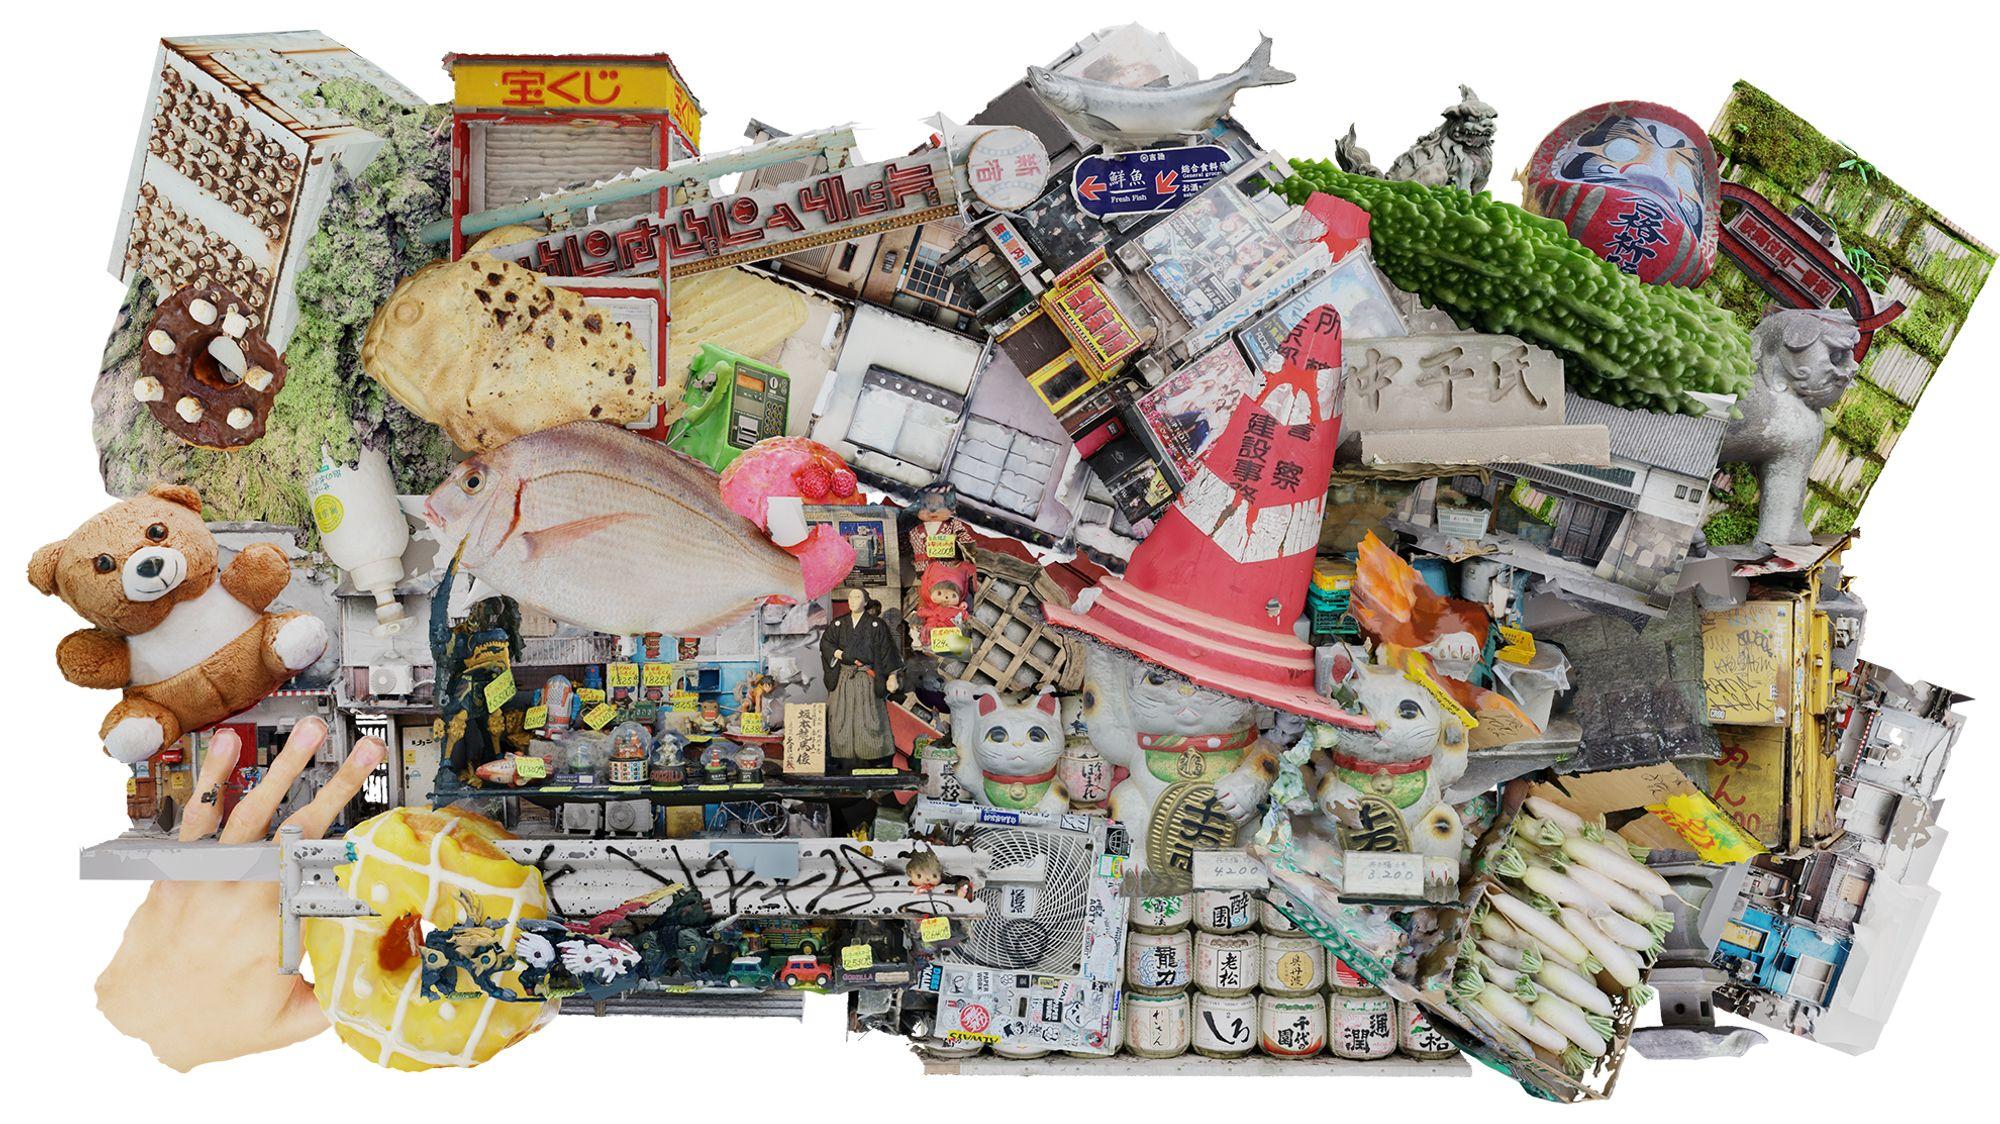 Reinventing Texture Workshop: Interior Design platforms Reuse and Urbanism